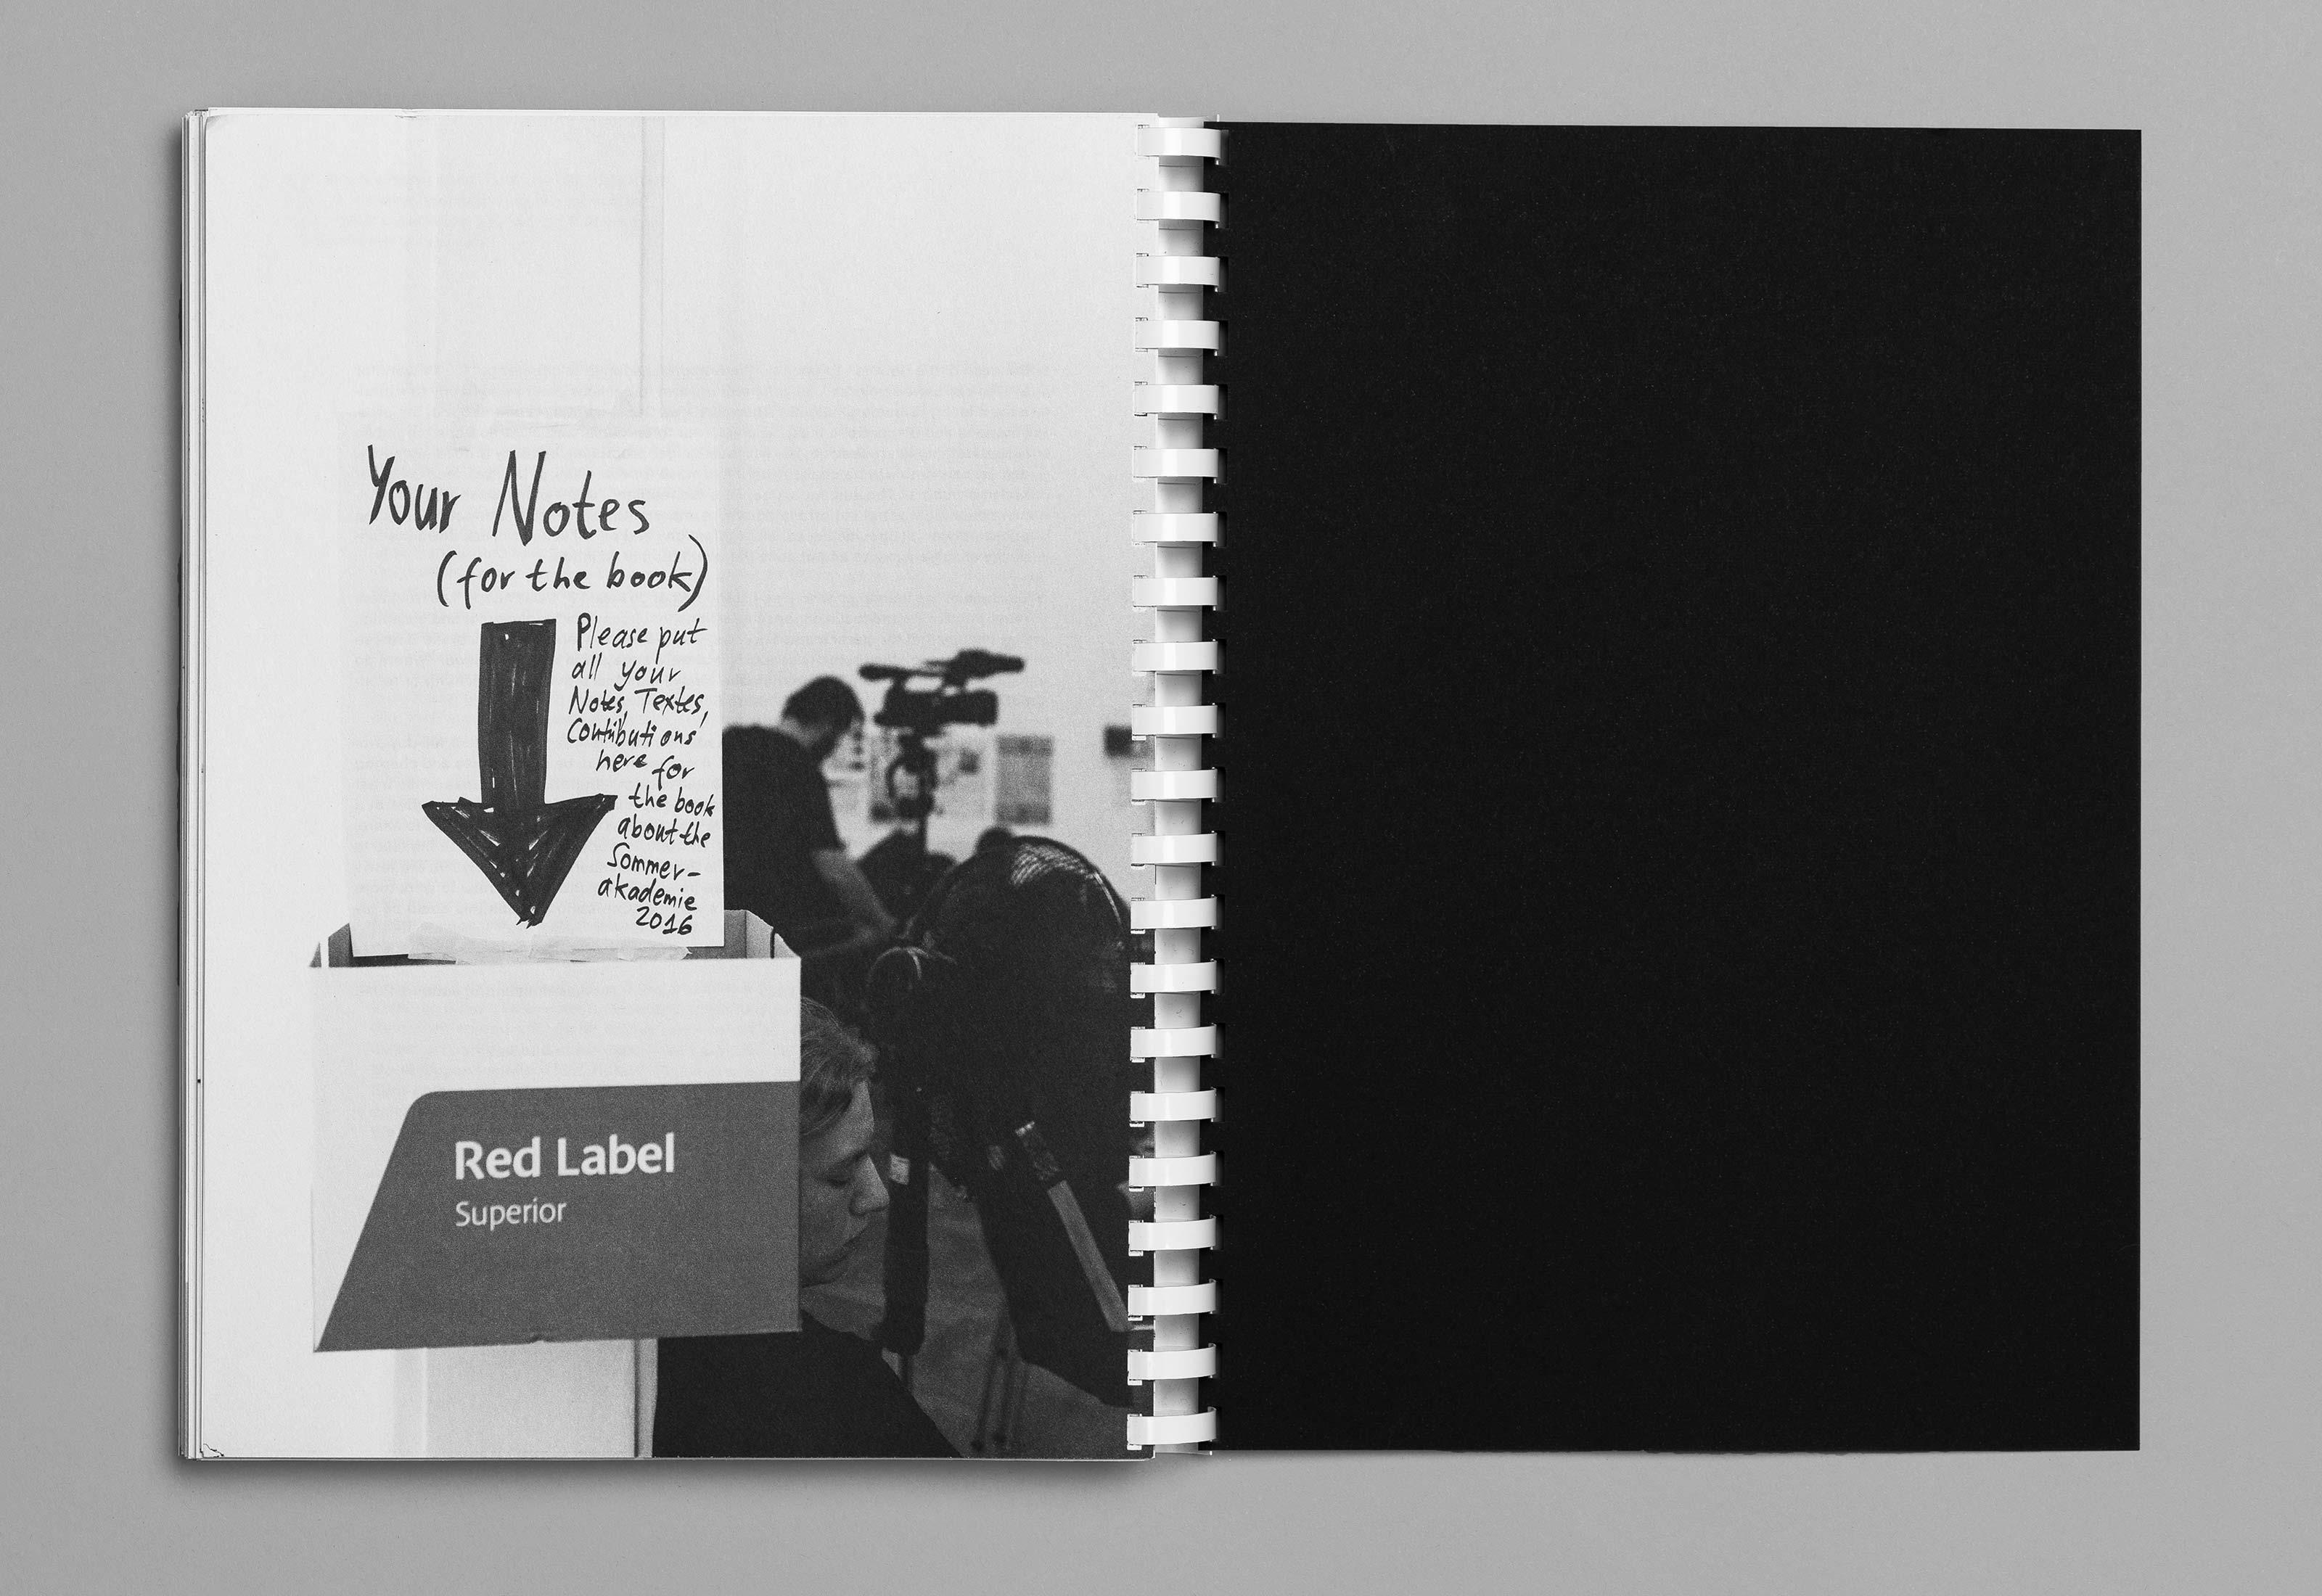 Sommerakademie im Zentrum Paul Klee 2016 – Publikation Thomas Hirschhorn, 18  ©Atelier Pol